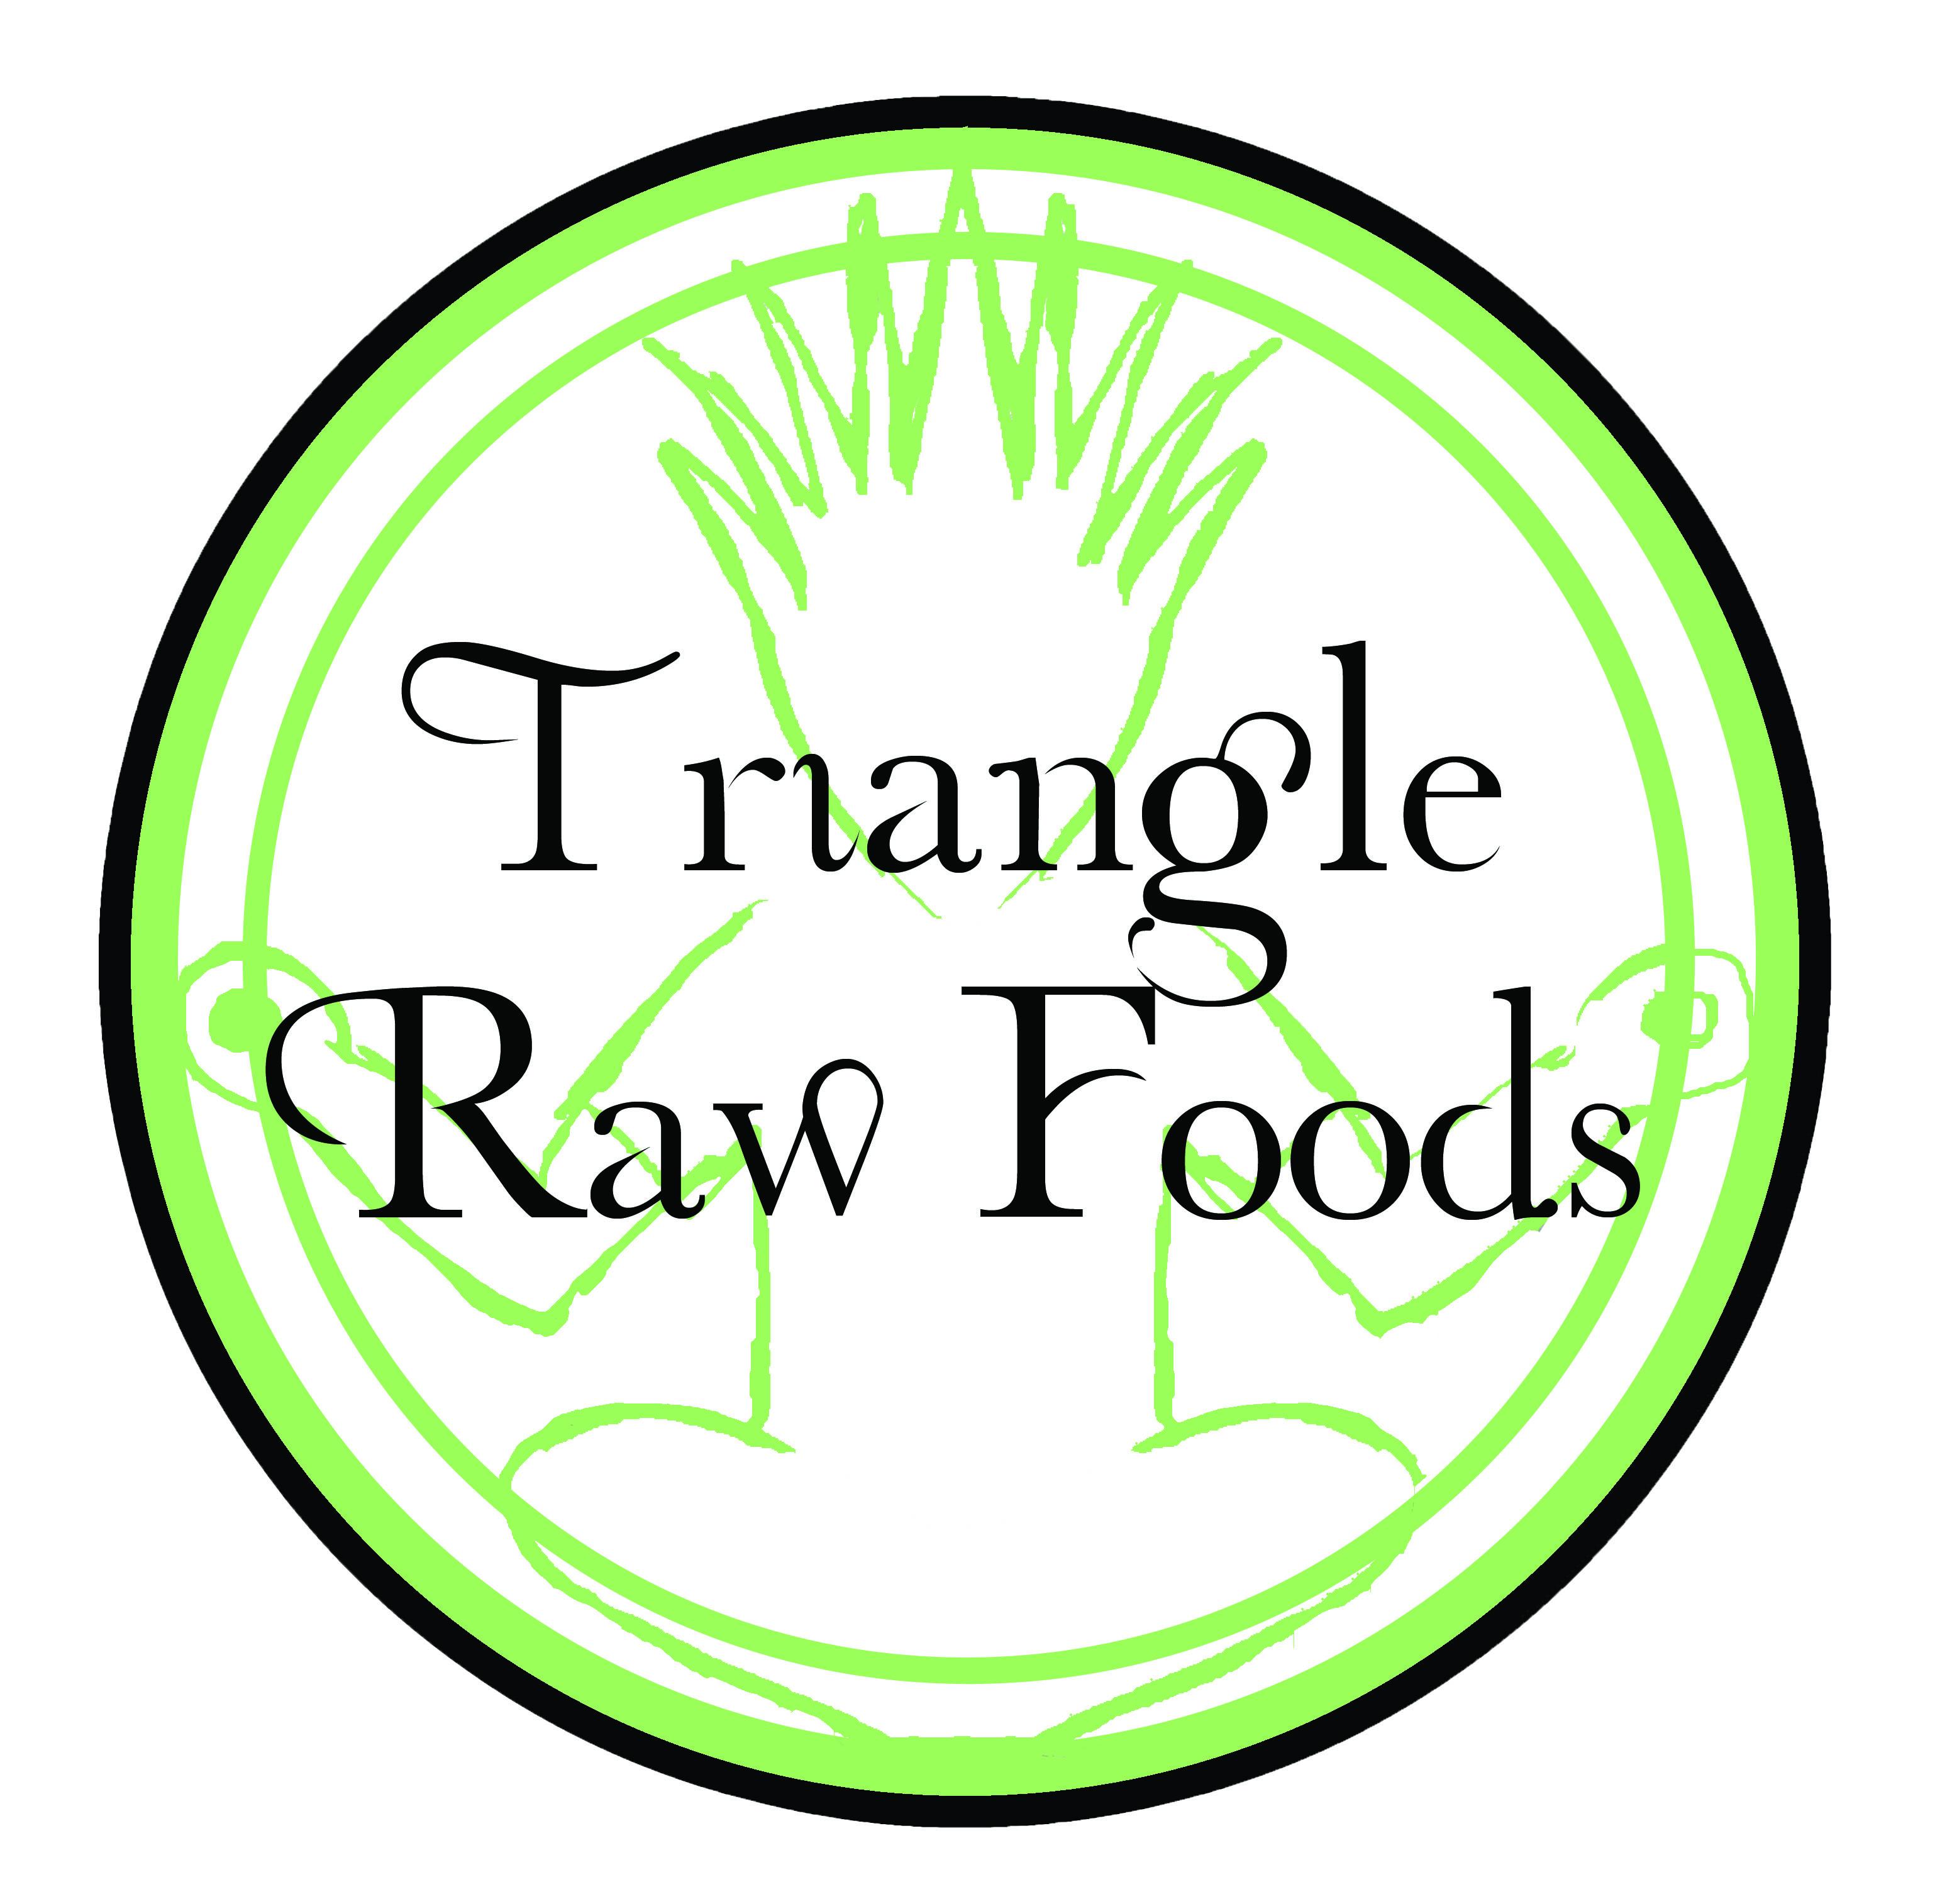 Triangle Raw Foods